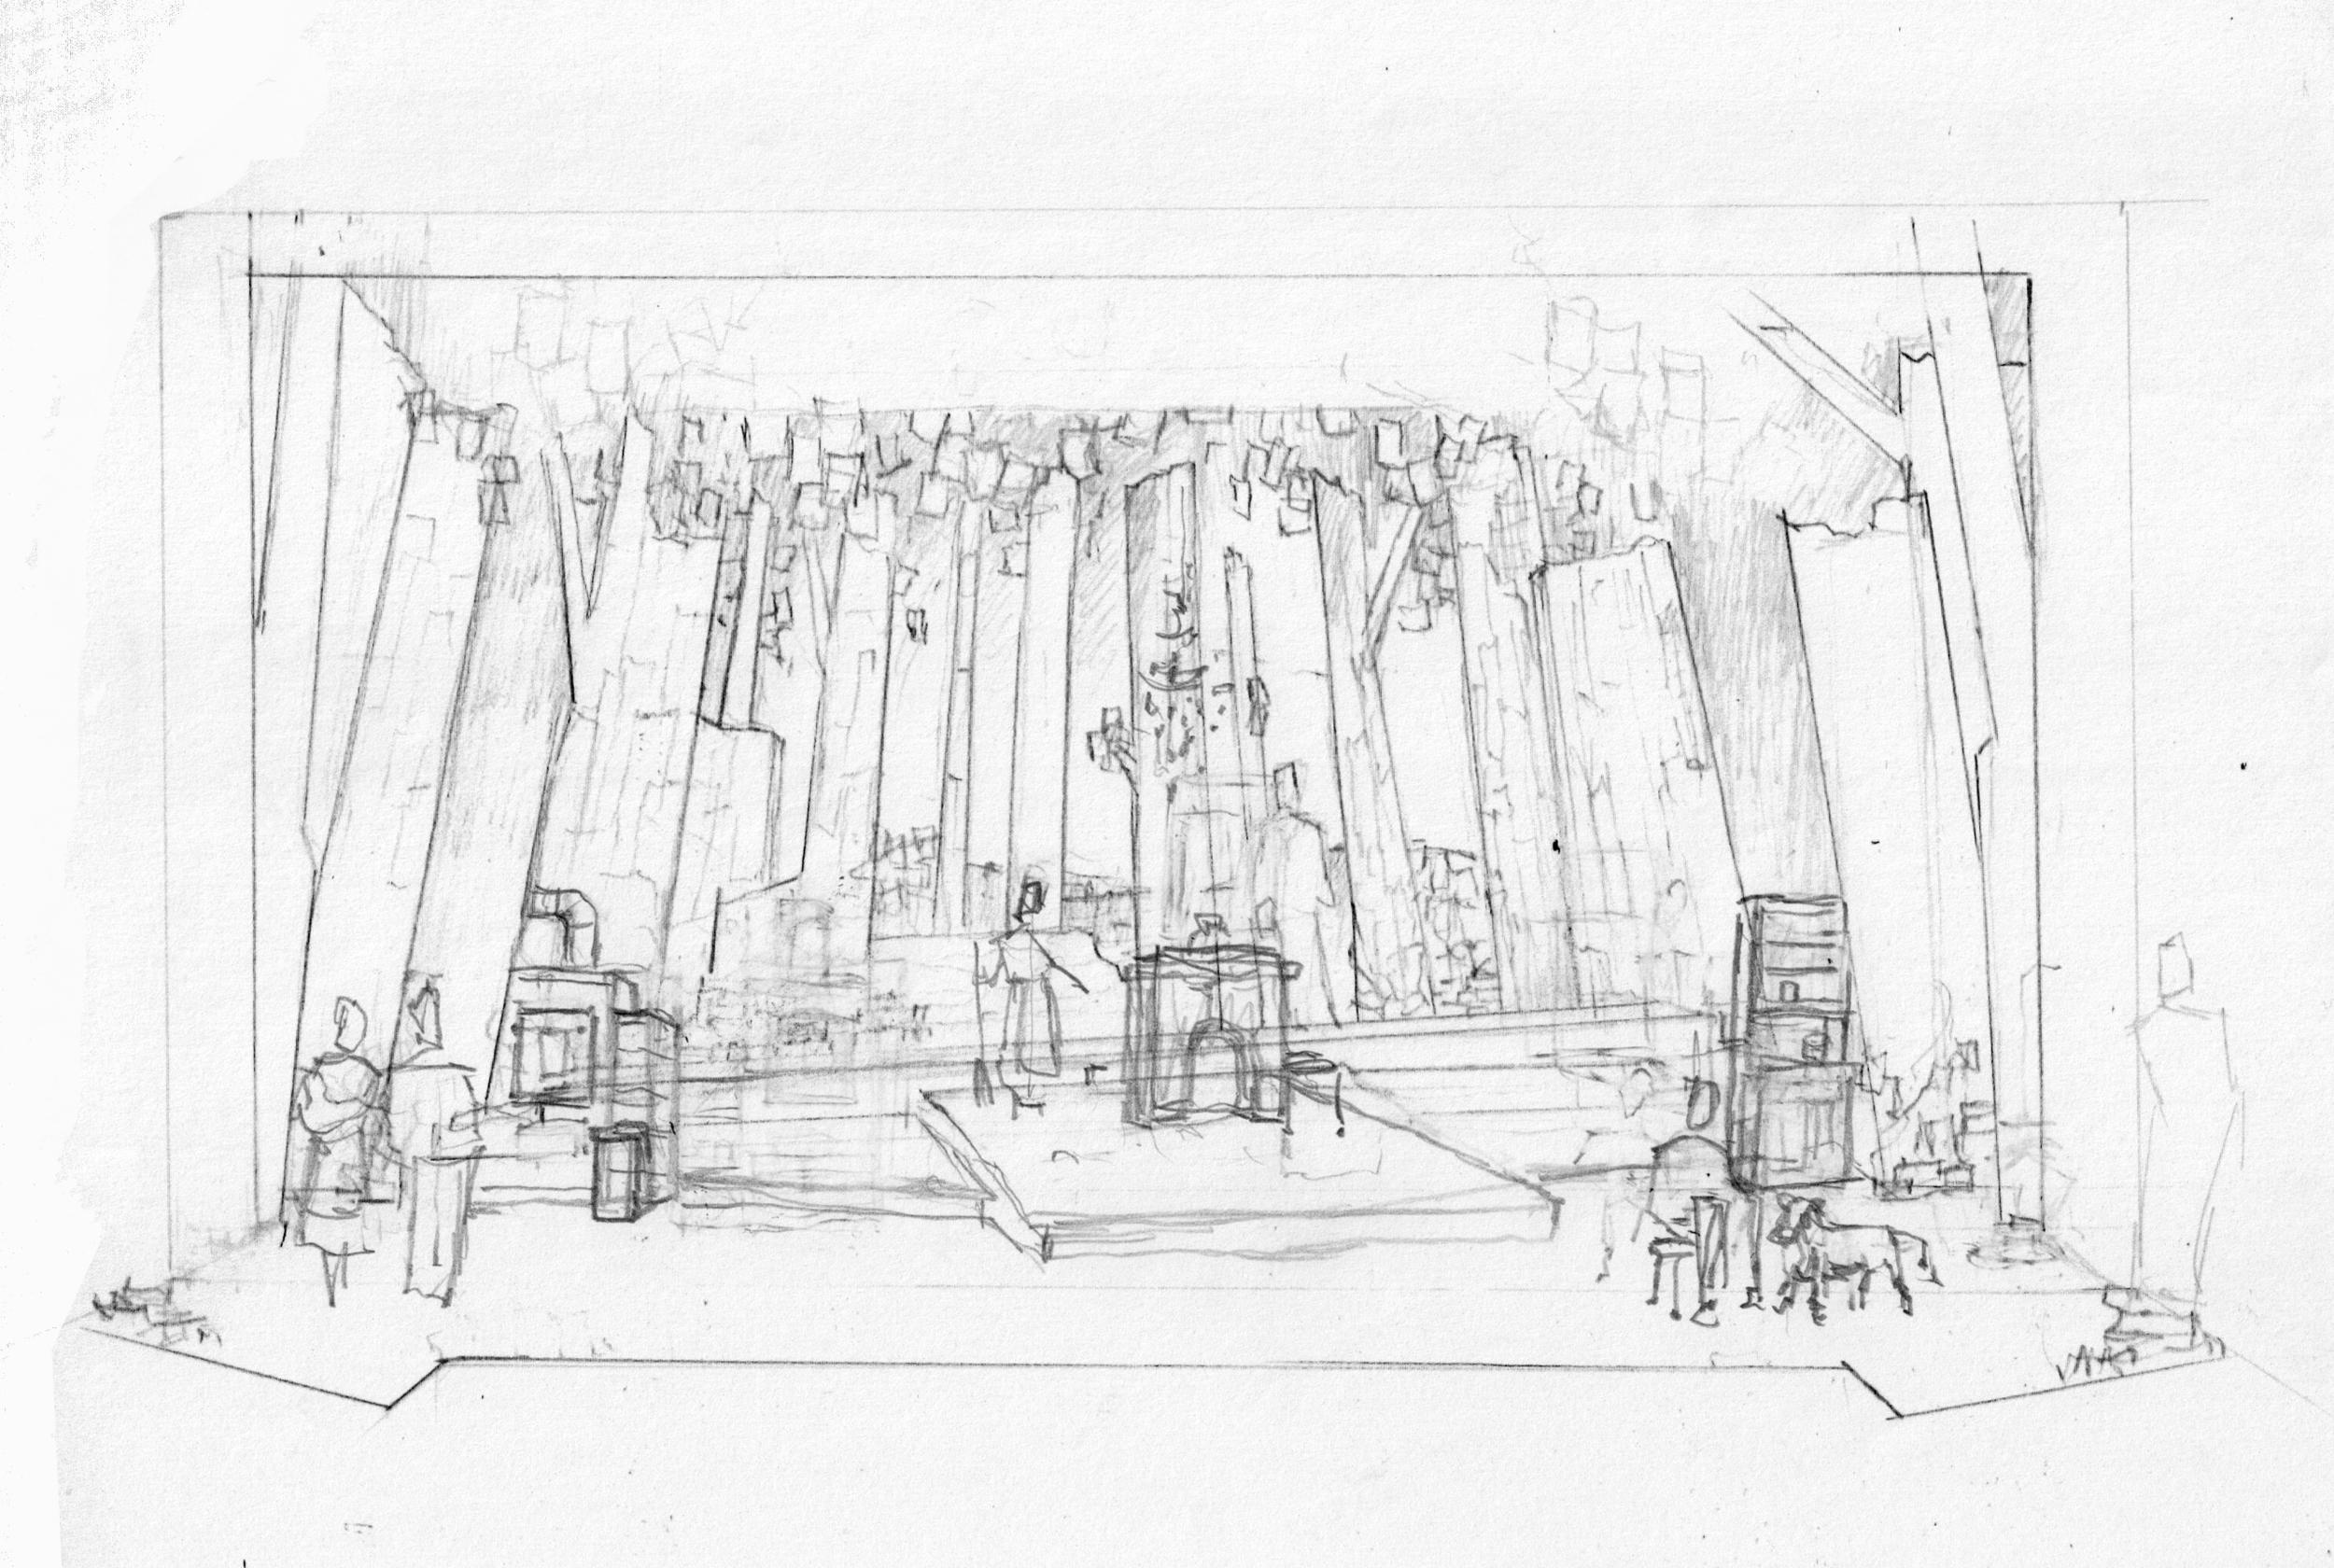 Sketches1-2.jpg